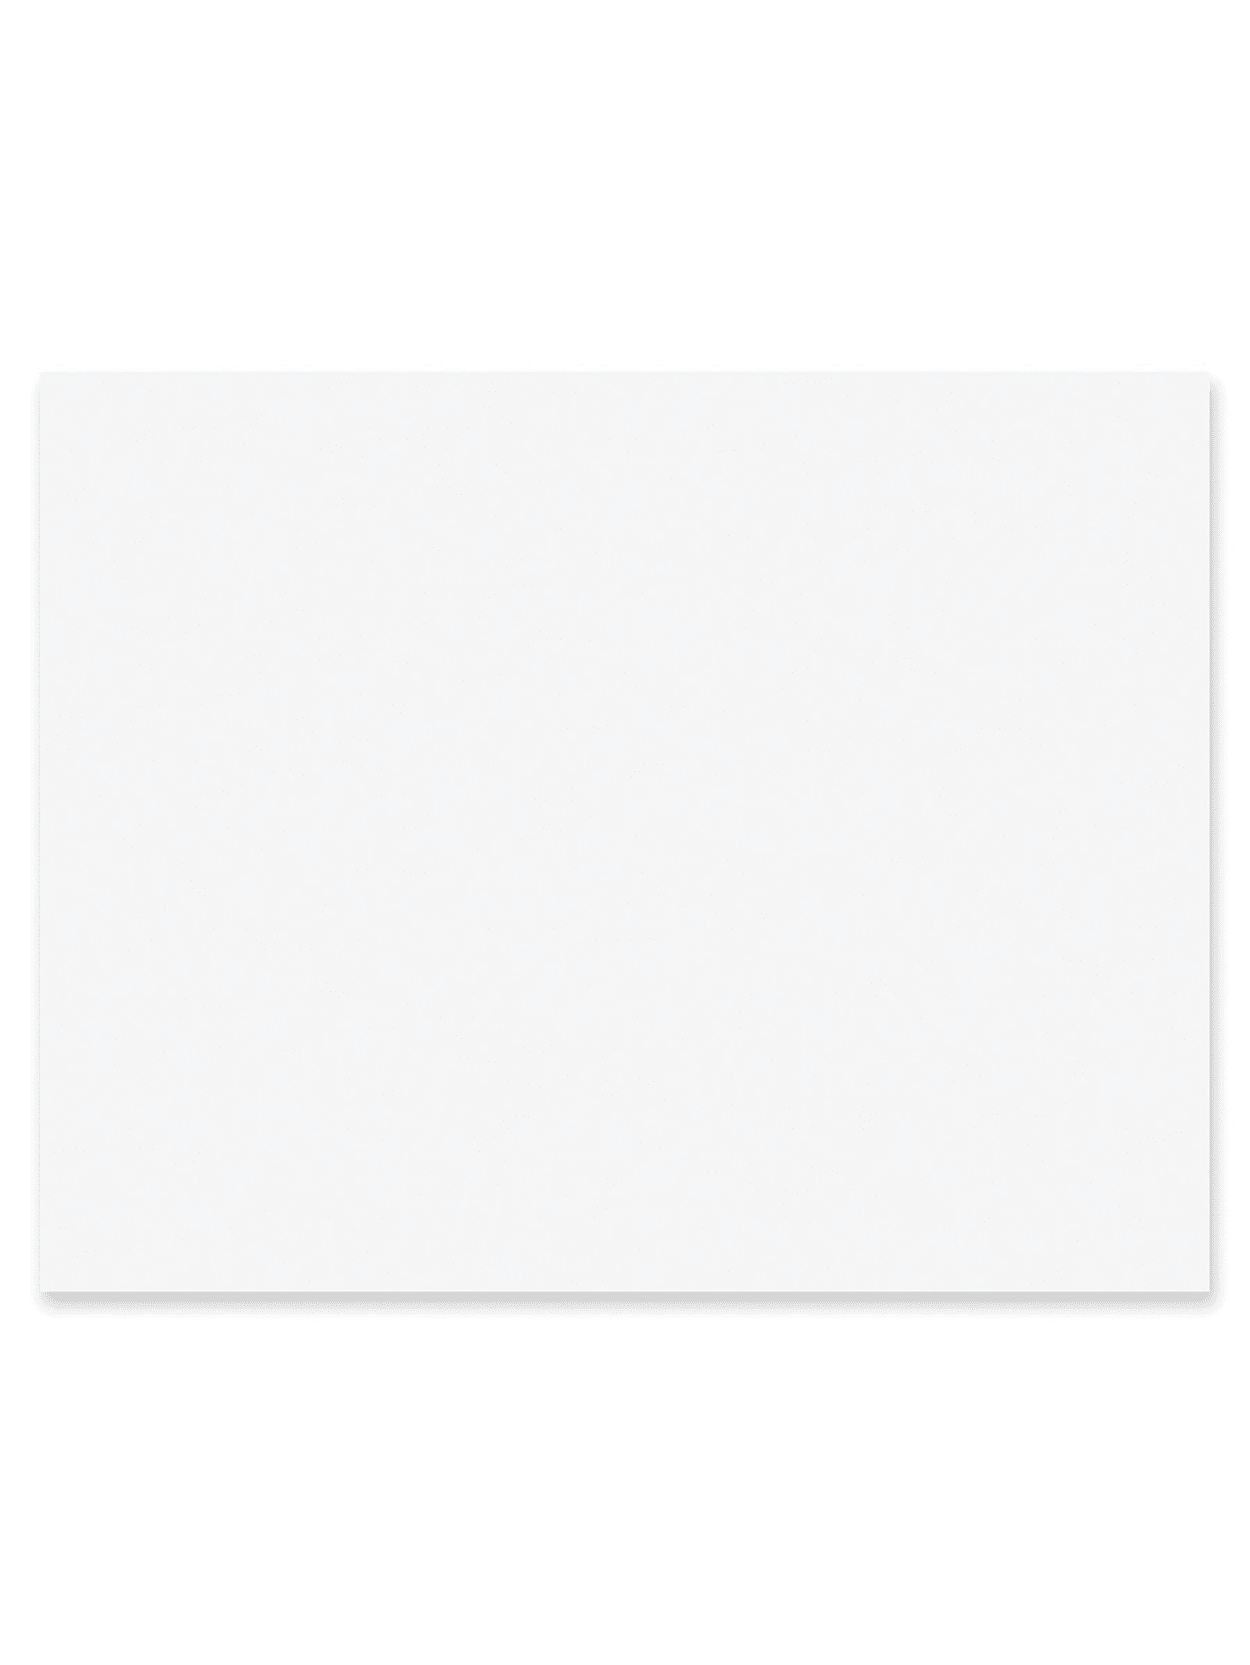 RiteCo 15211 Posterboard//Railroad Board Pack of 25 4-Ply 22 x 28 Light Blue